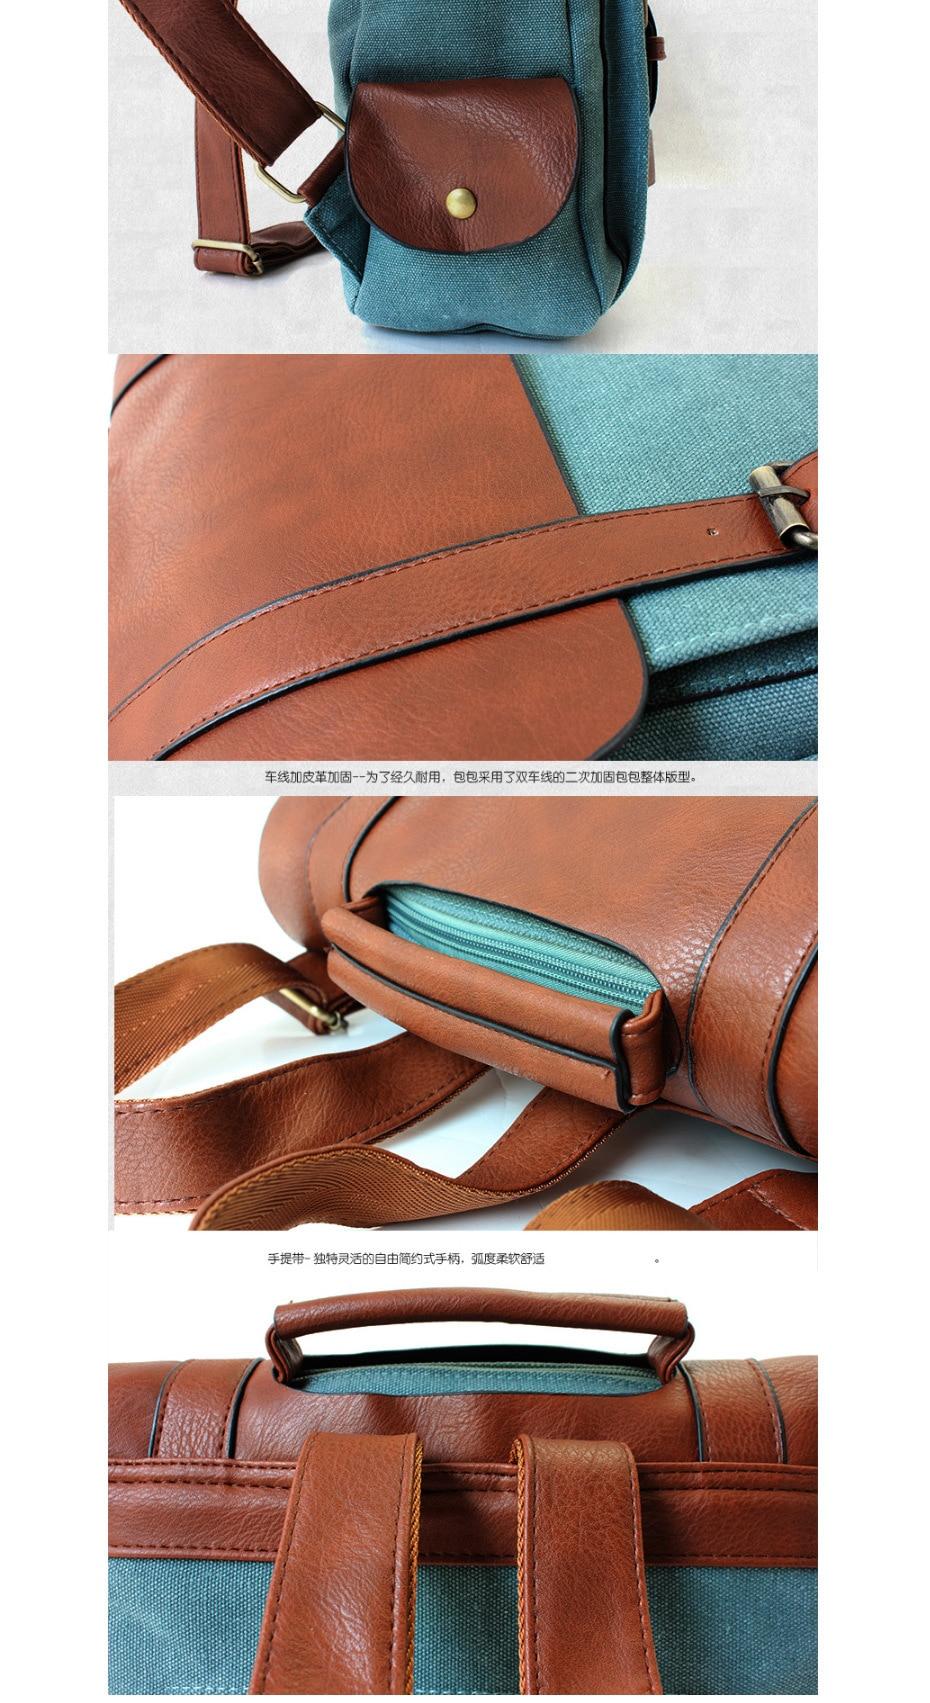 HTB15vCHgFOWBuNjy0Fiq6xFxVXak - 2018 Fashion Women Leather School Vintage Backpack Men Small Schoolbag Mochila Feminina Brown Black Backpacks Kanken Sac A Dos